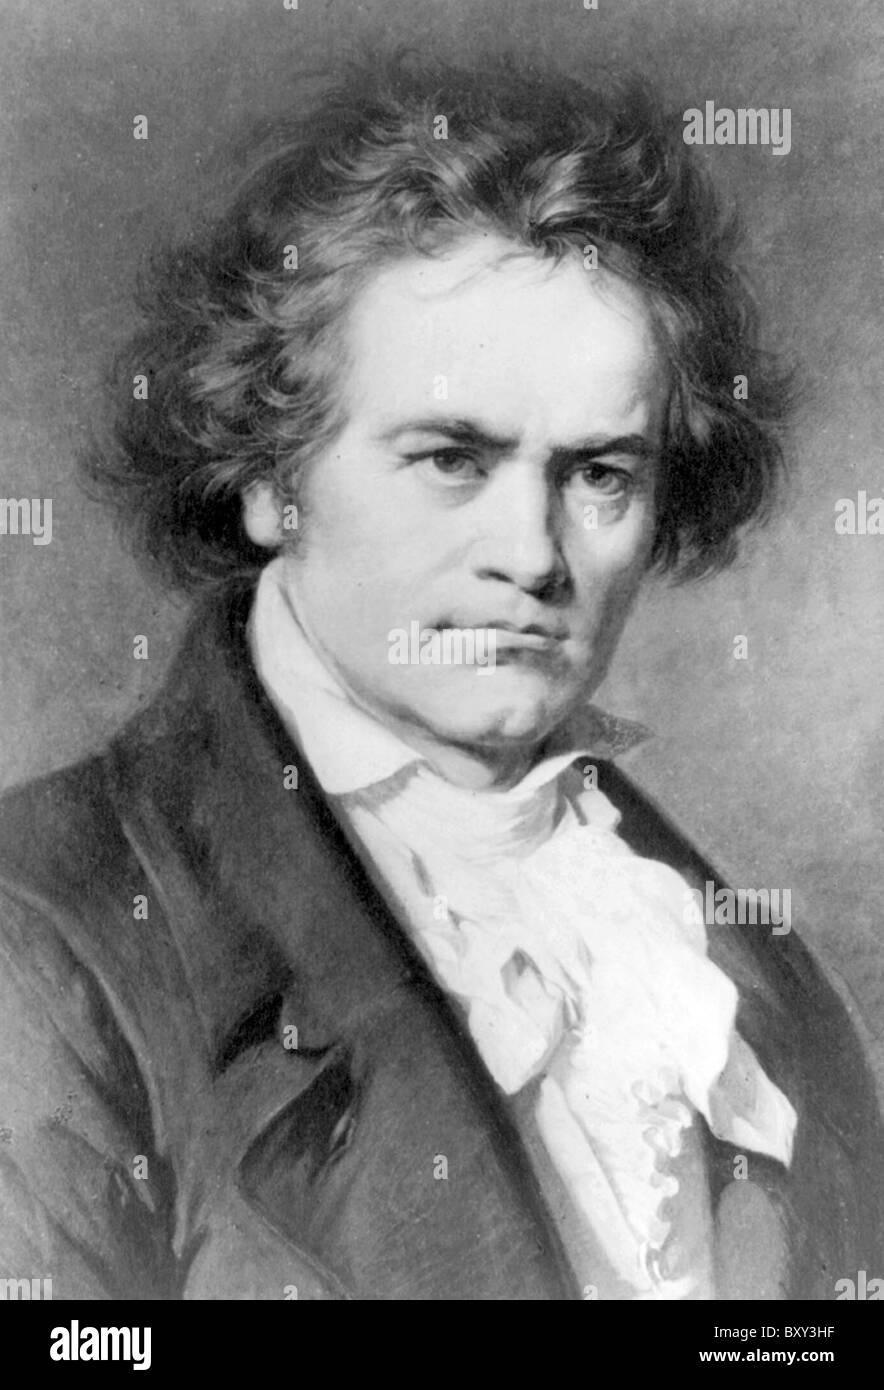 Beethoven, Ludwig van Beethoven, German composer and pianist. Stock Photo